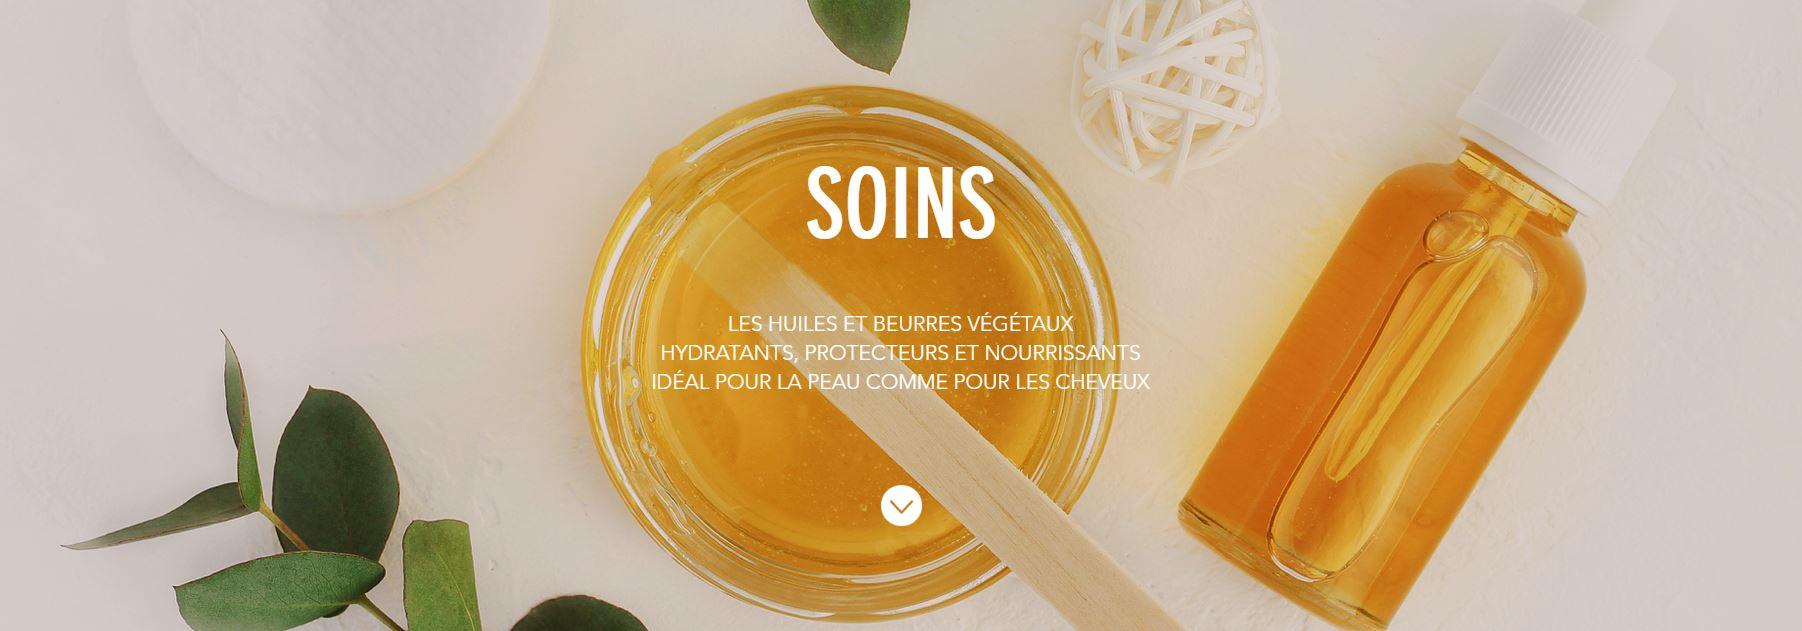 SOINS_WIX.JPG